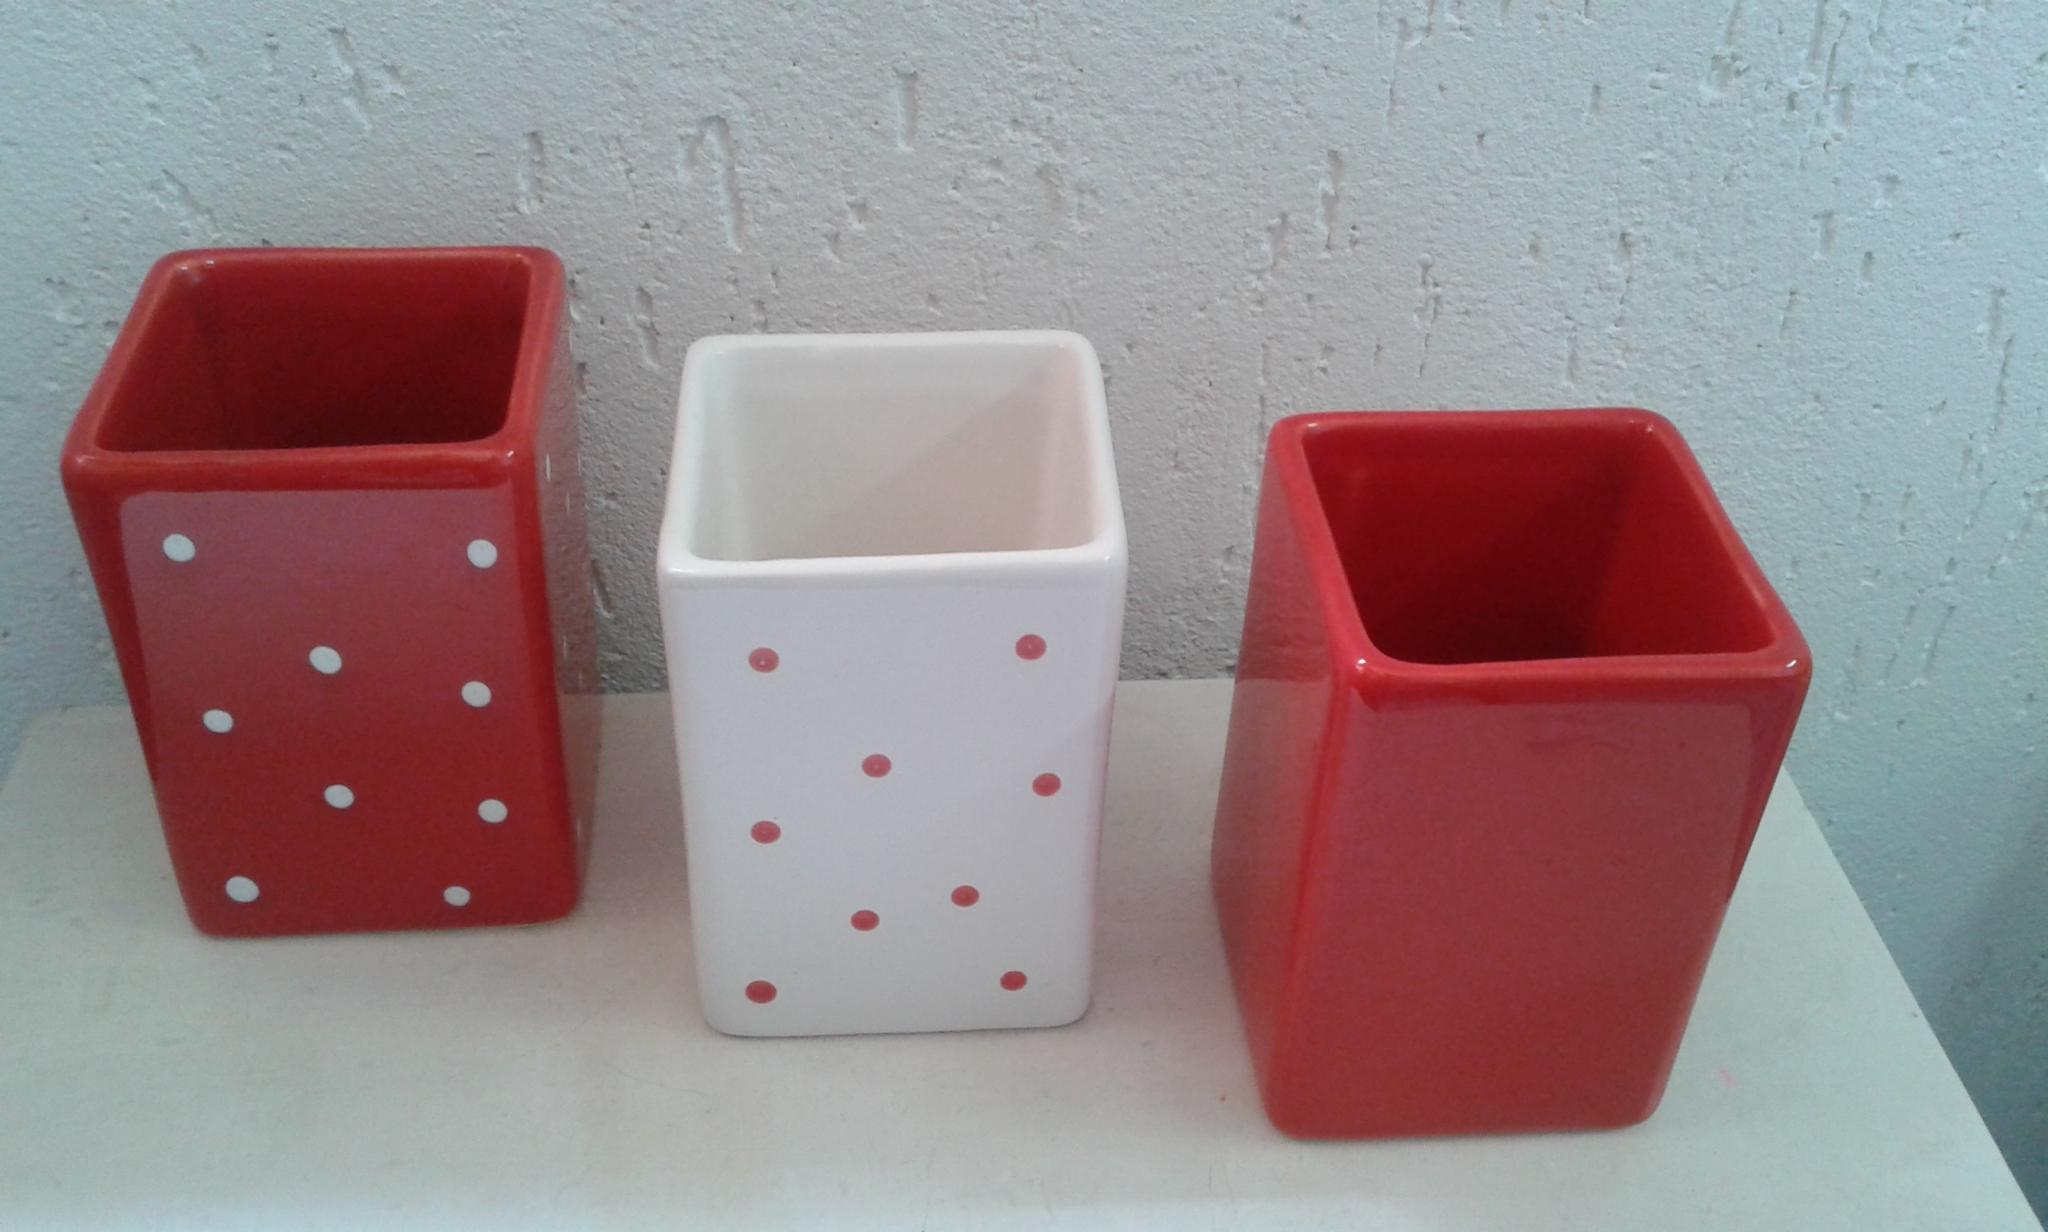 Pin Kit Banheiro M Vermelho E Branco Kit Banheiro M Vermelho E Branco  #4C0A0C 2048x1232 Banheiro Branco Com Detalhe Vermelho